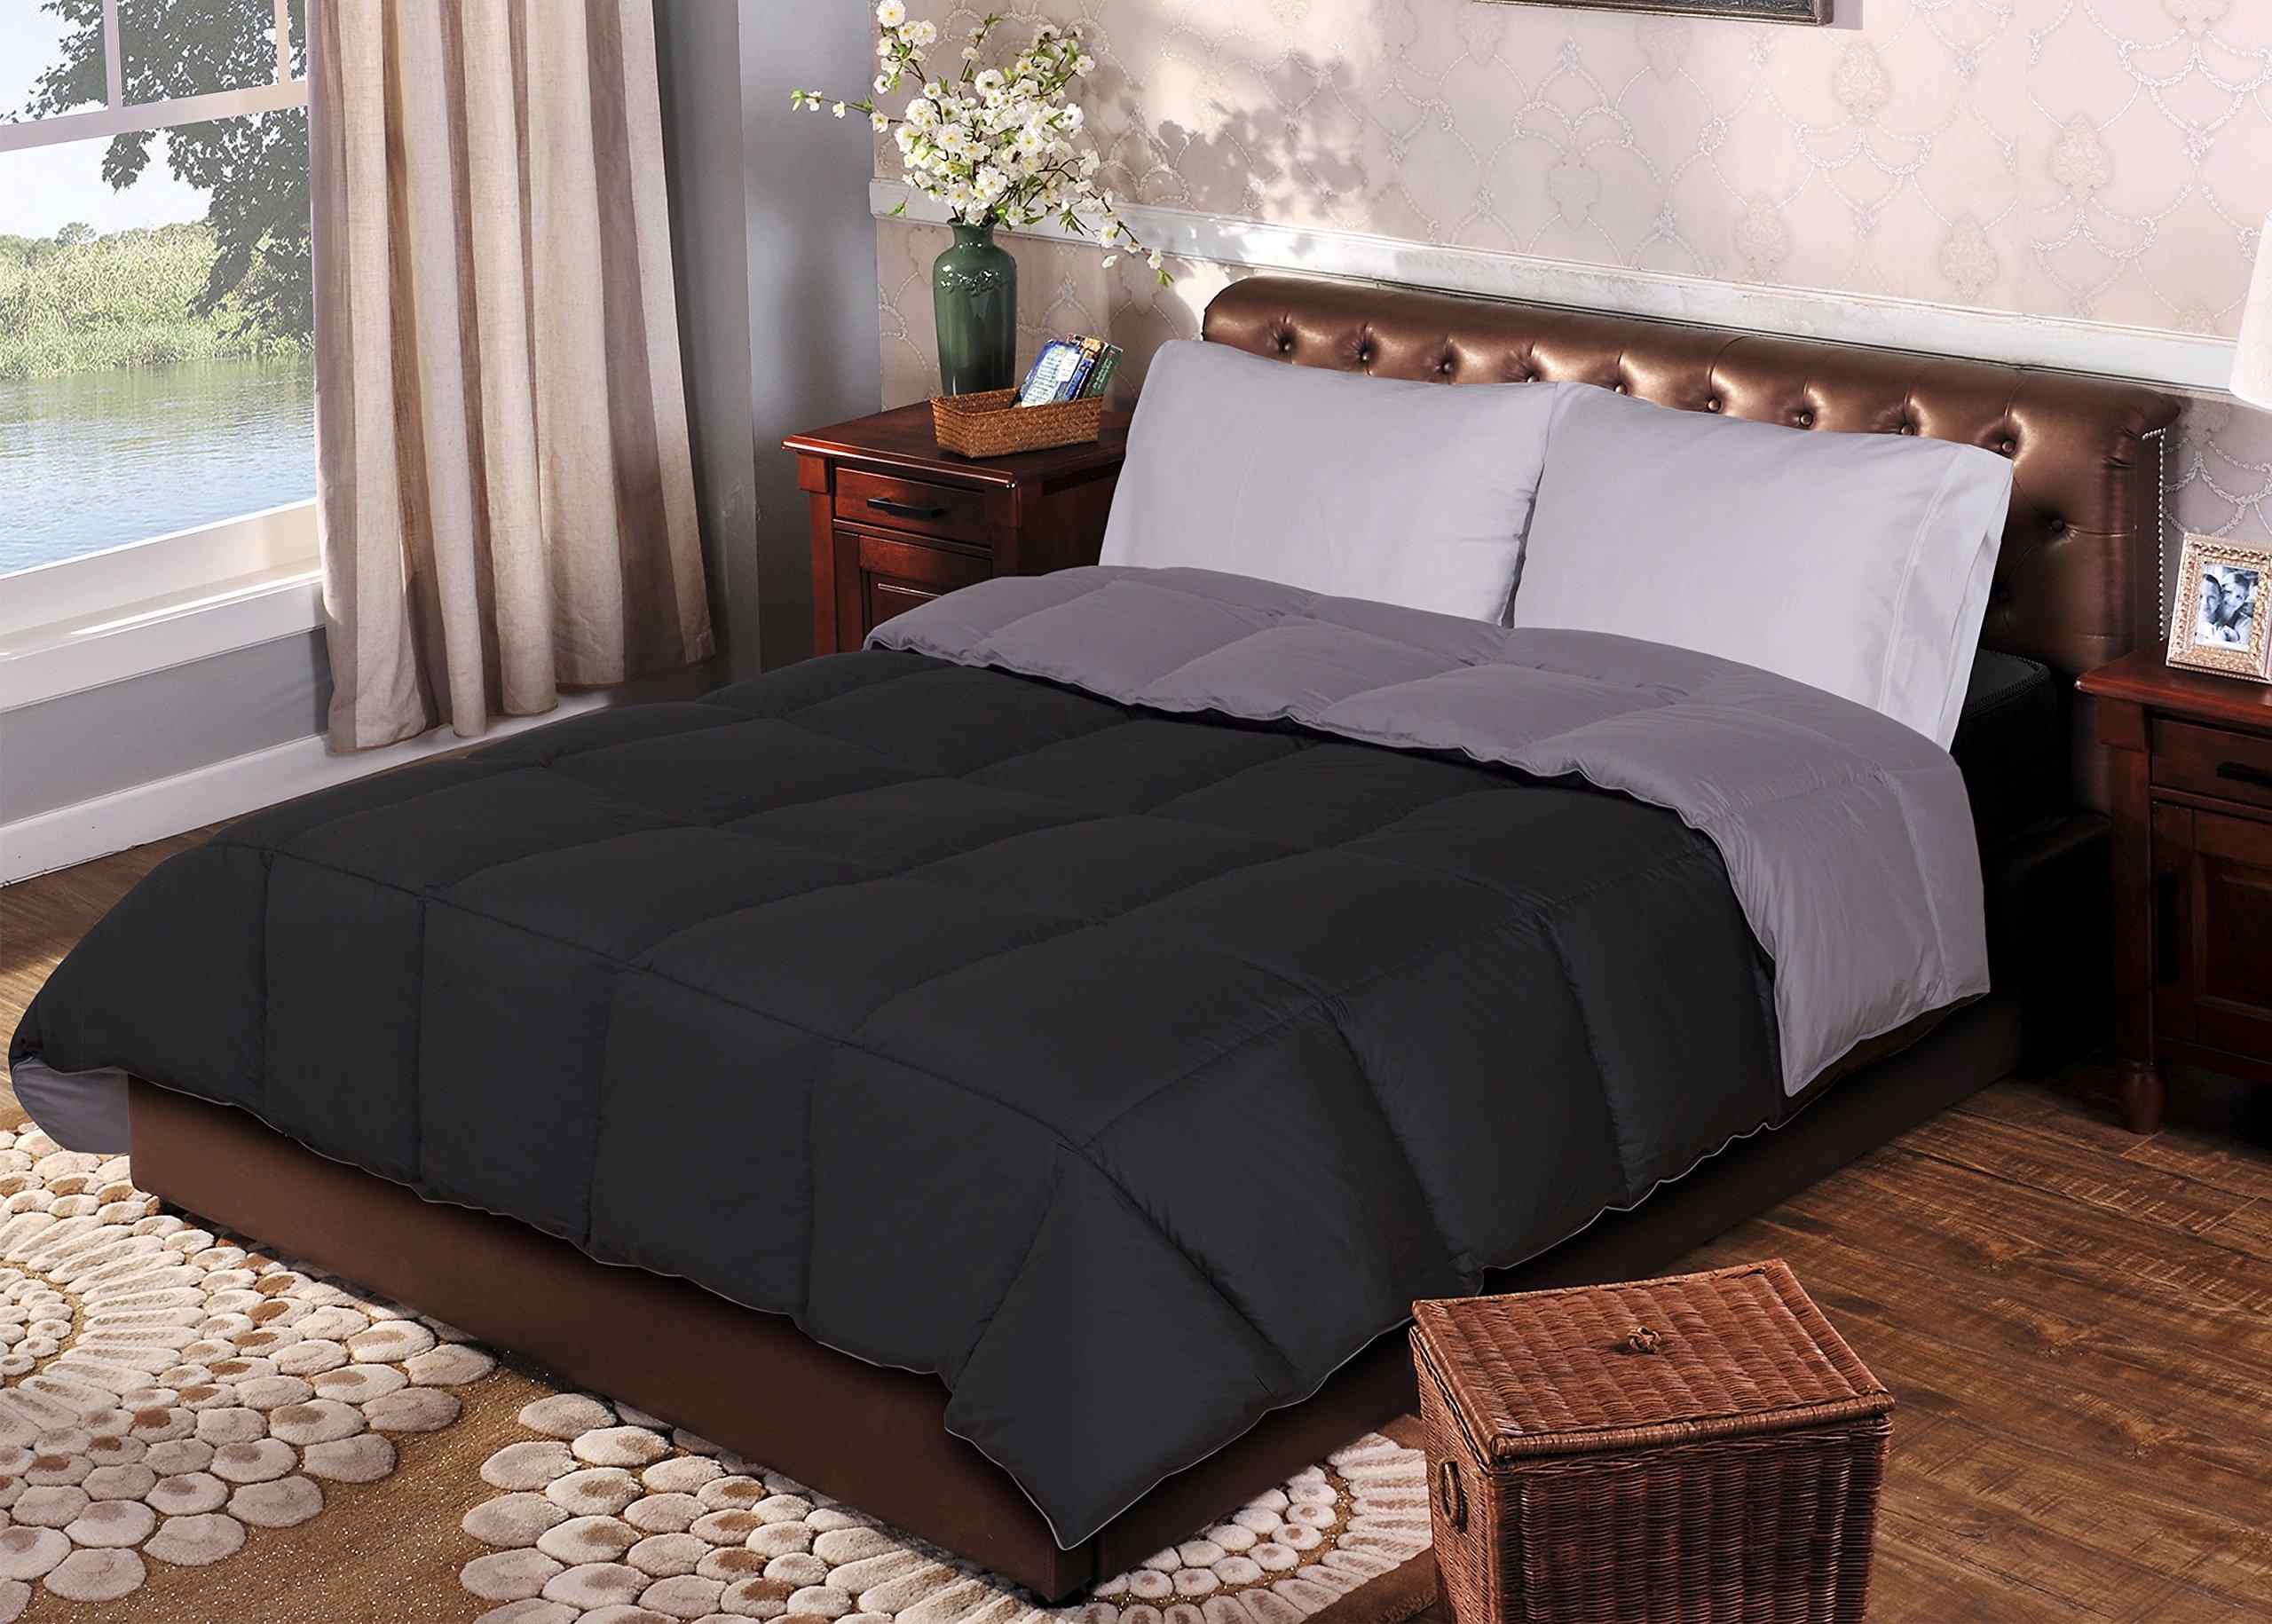 Superior Reversible Down Alternative Comforter, Medium Weight Bedding for All Season Use, Fluffy, Warm, Soft & Hypoallergenic - Full/Queen Size, Black & Grey